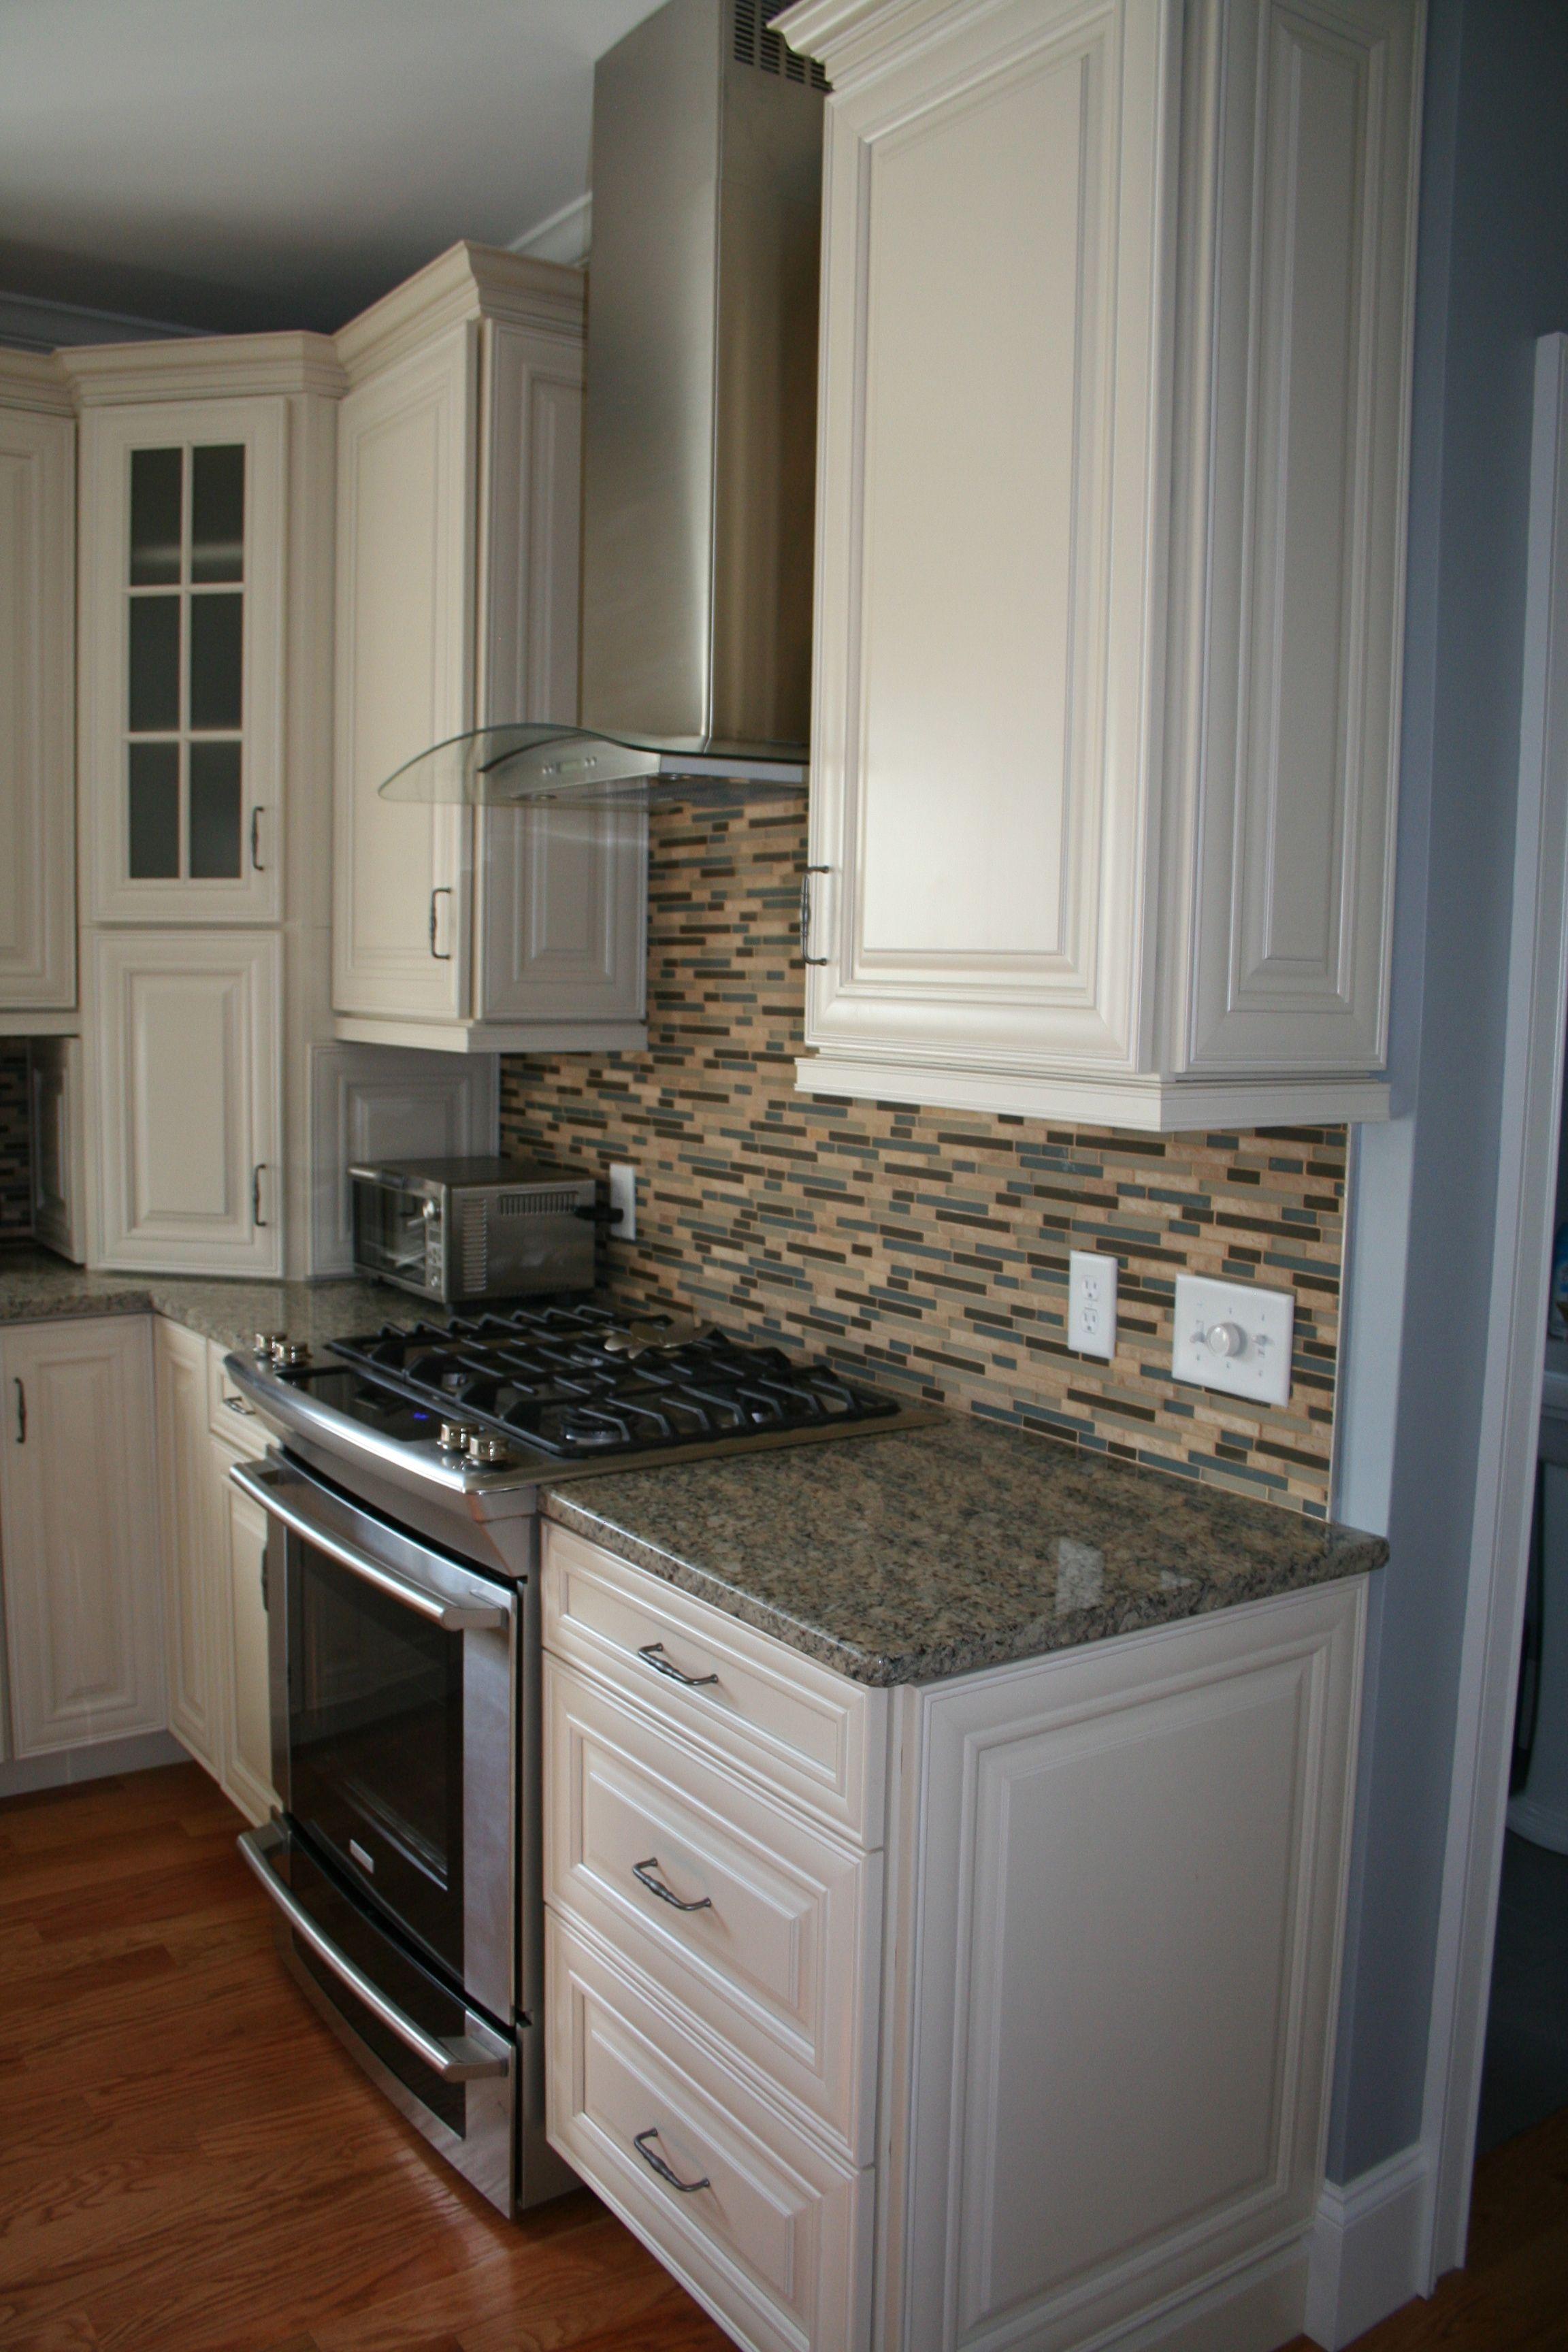 Waypoint Kitchen Cabinets Restoration Hardware Island Cabinetry In Maple Cream Featuring An Appliance